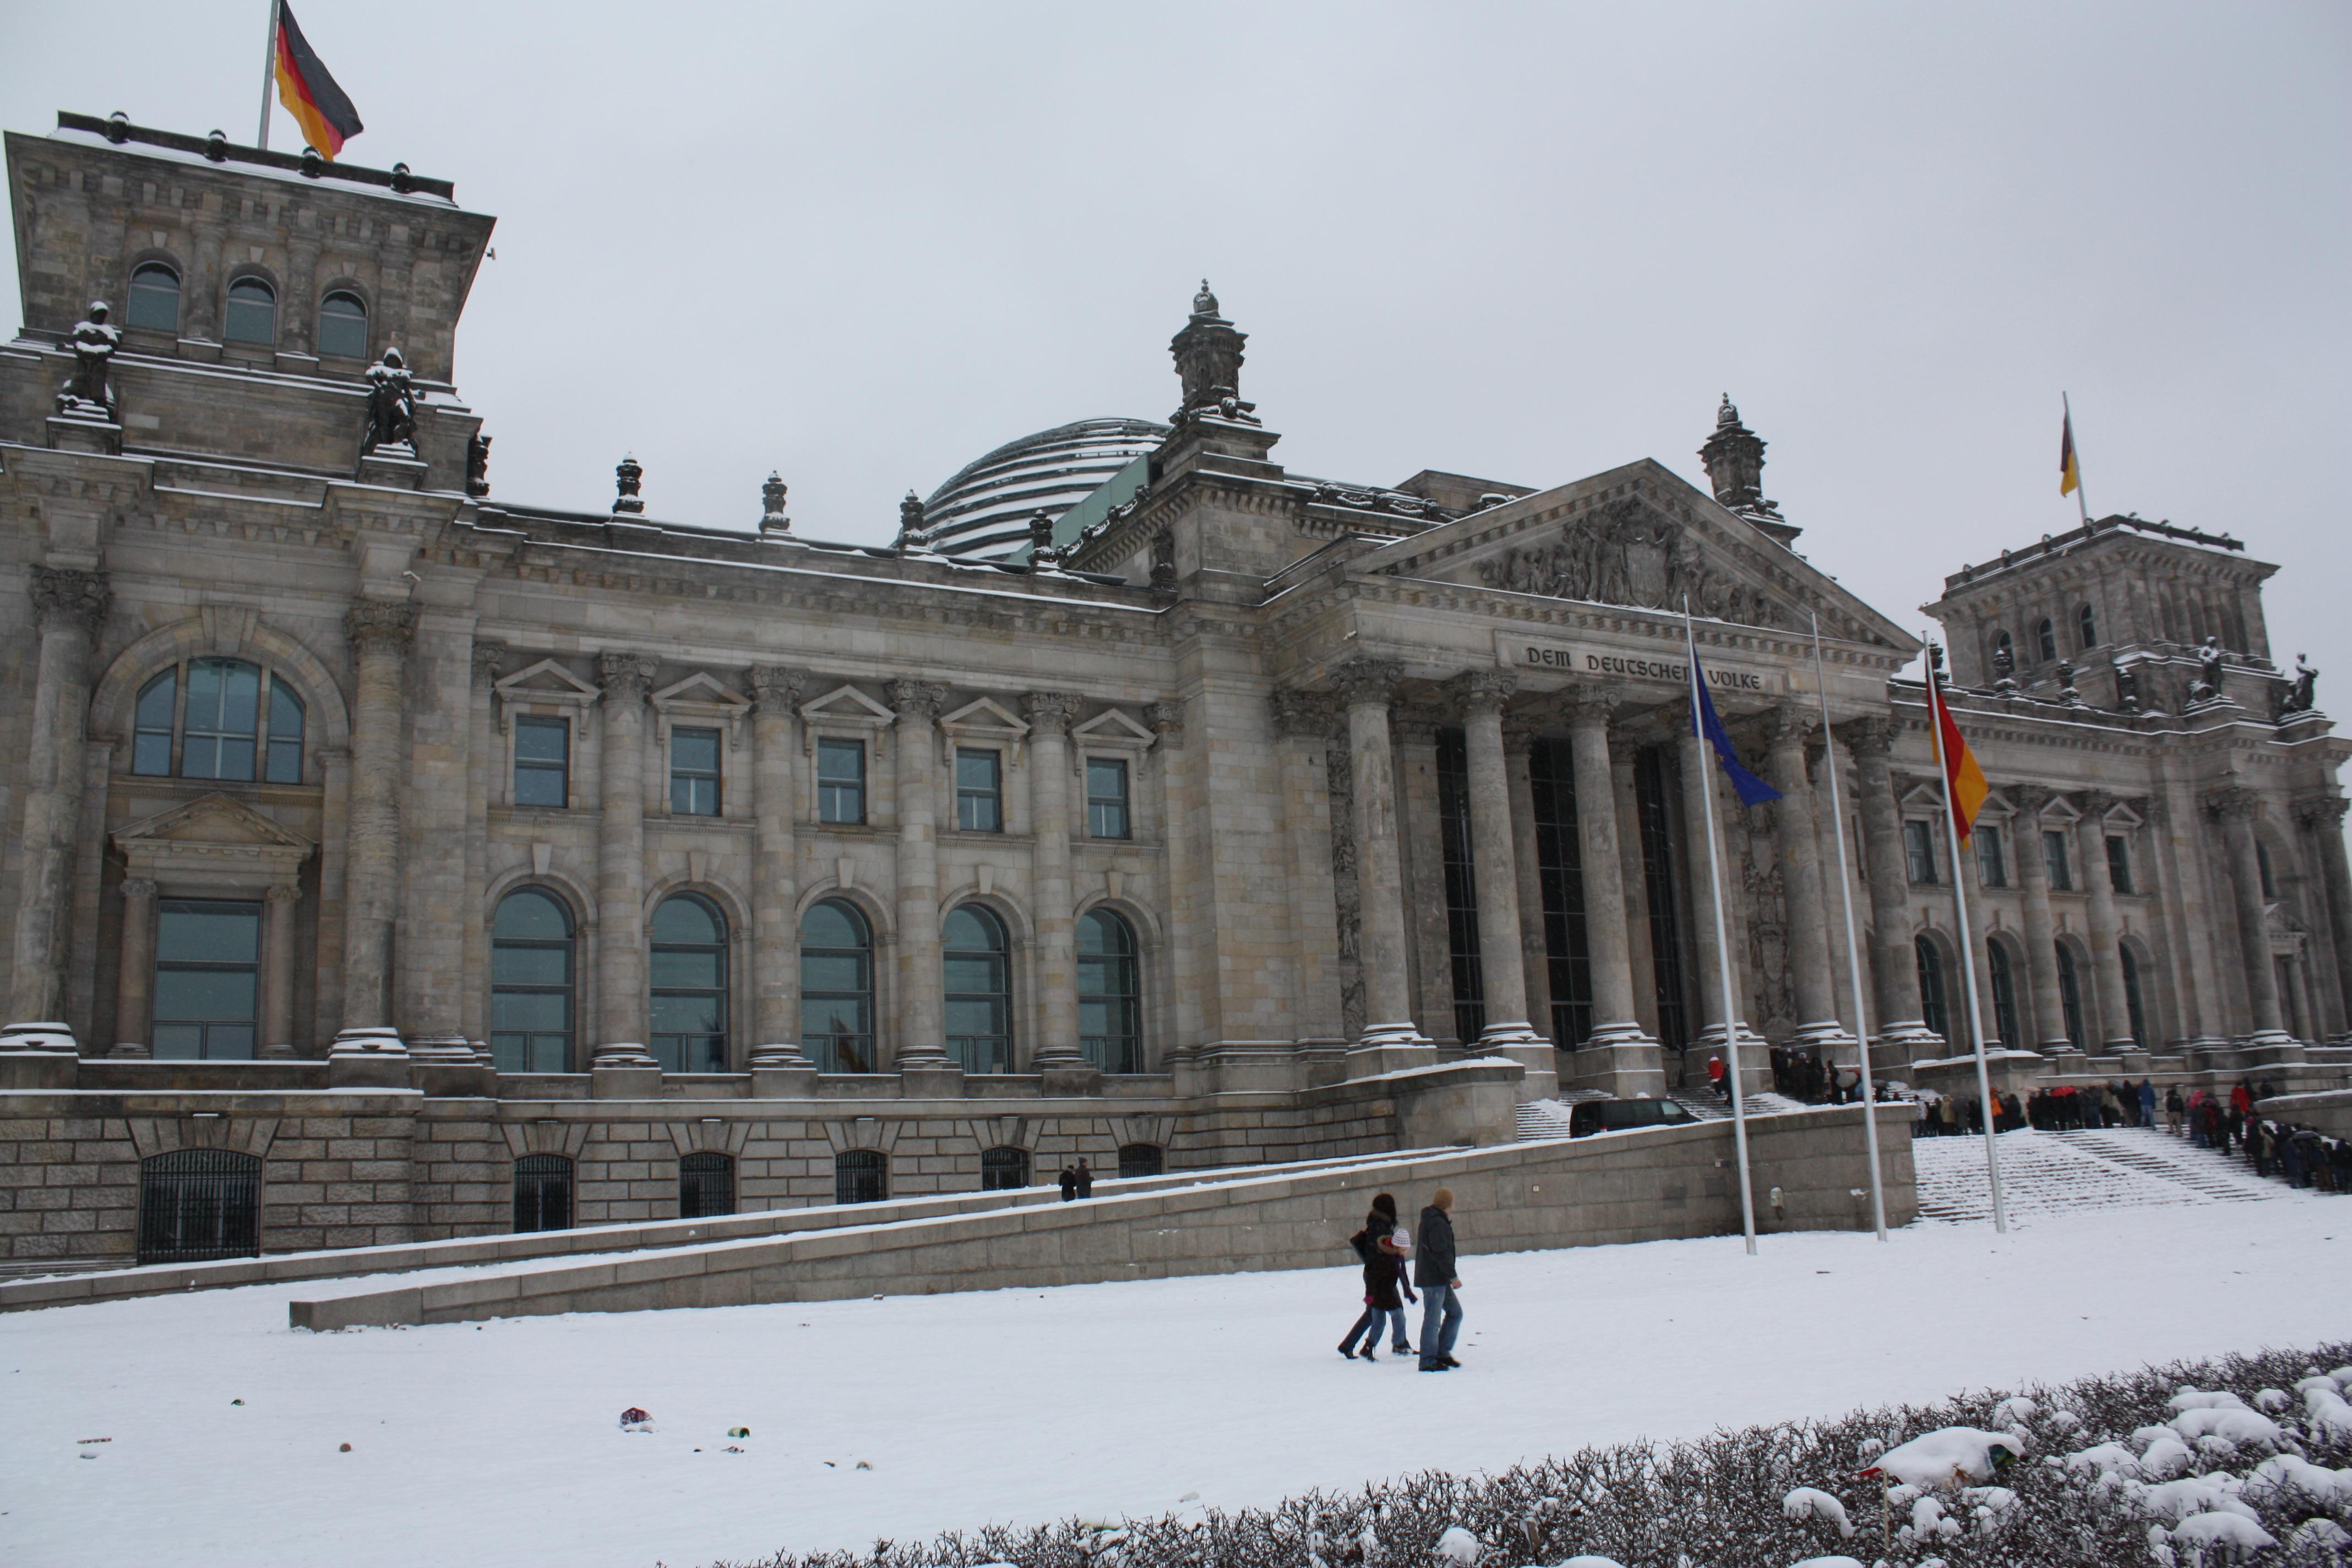 v rossii otkroyutsya vizovye centry germanii В России откроются визовые центры Германии